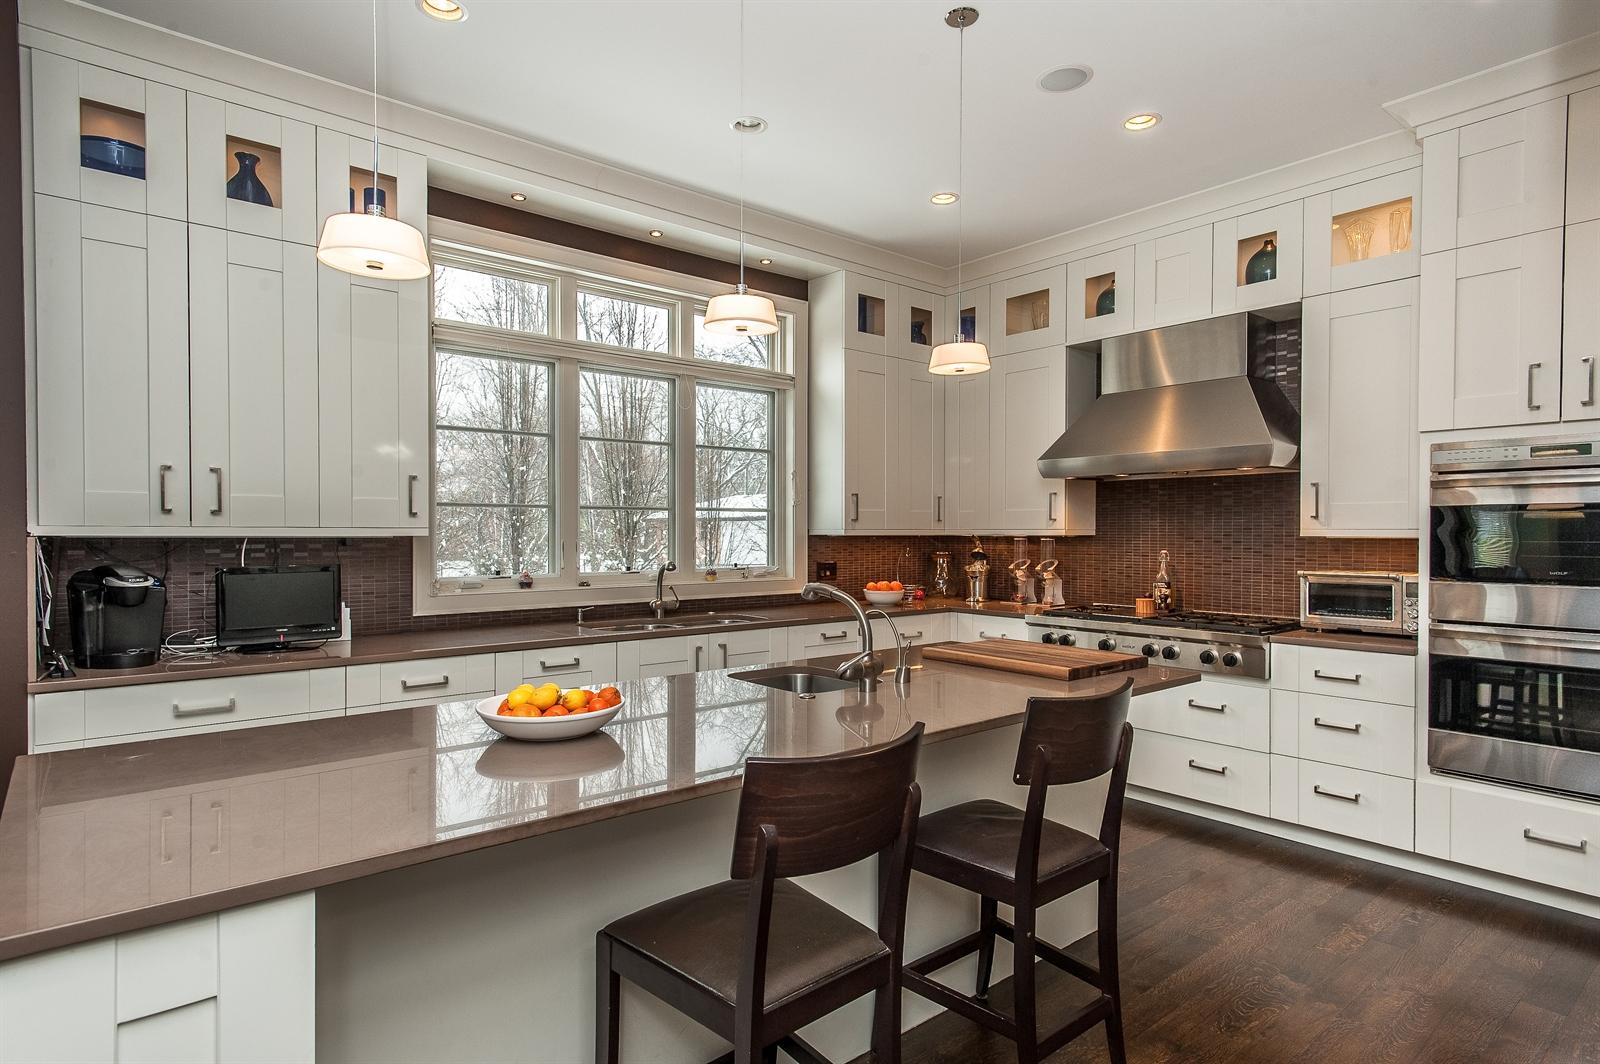 Real Estate Photography - 1715 Cloverdale Ave, Highland Park, IL, 60035 - Kitchen